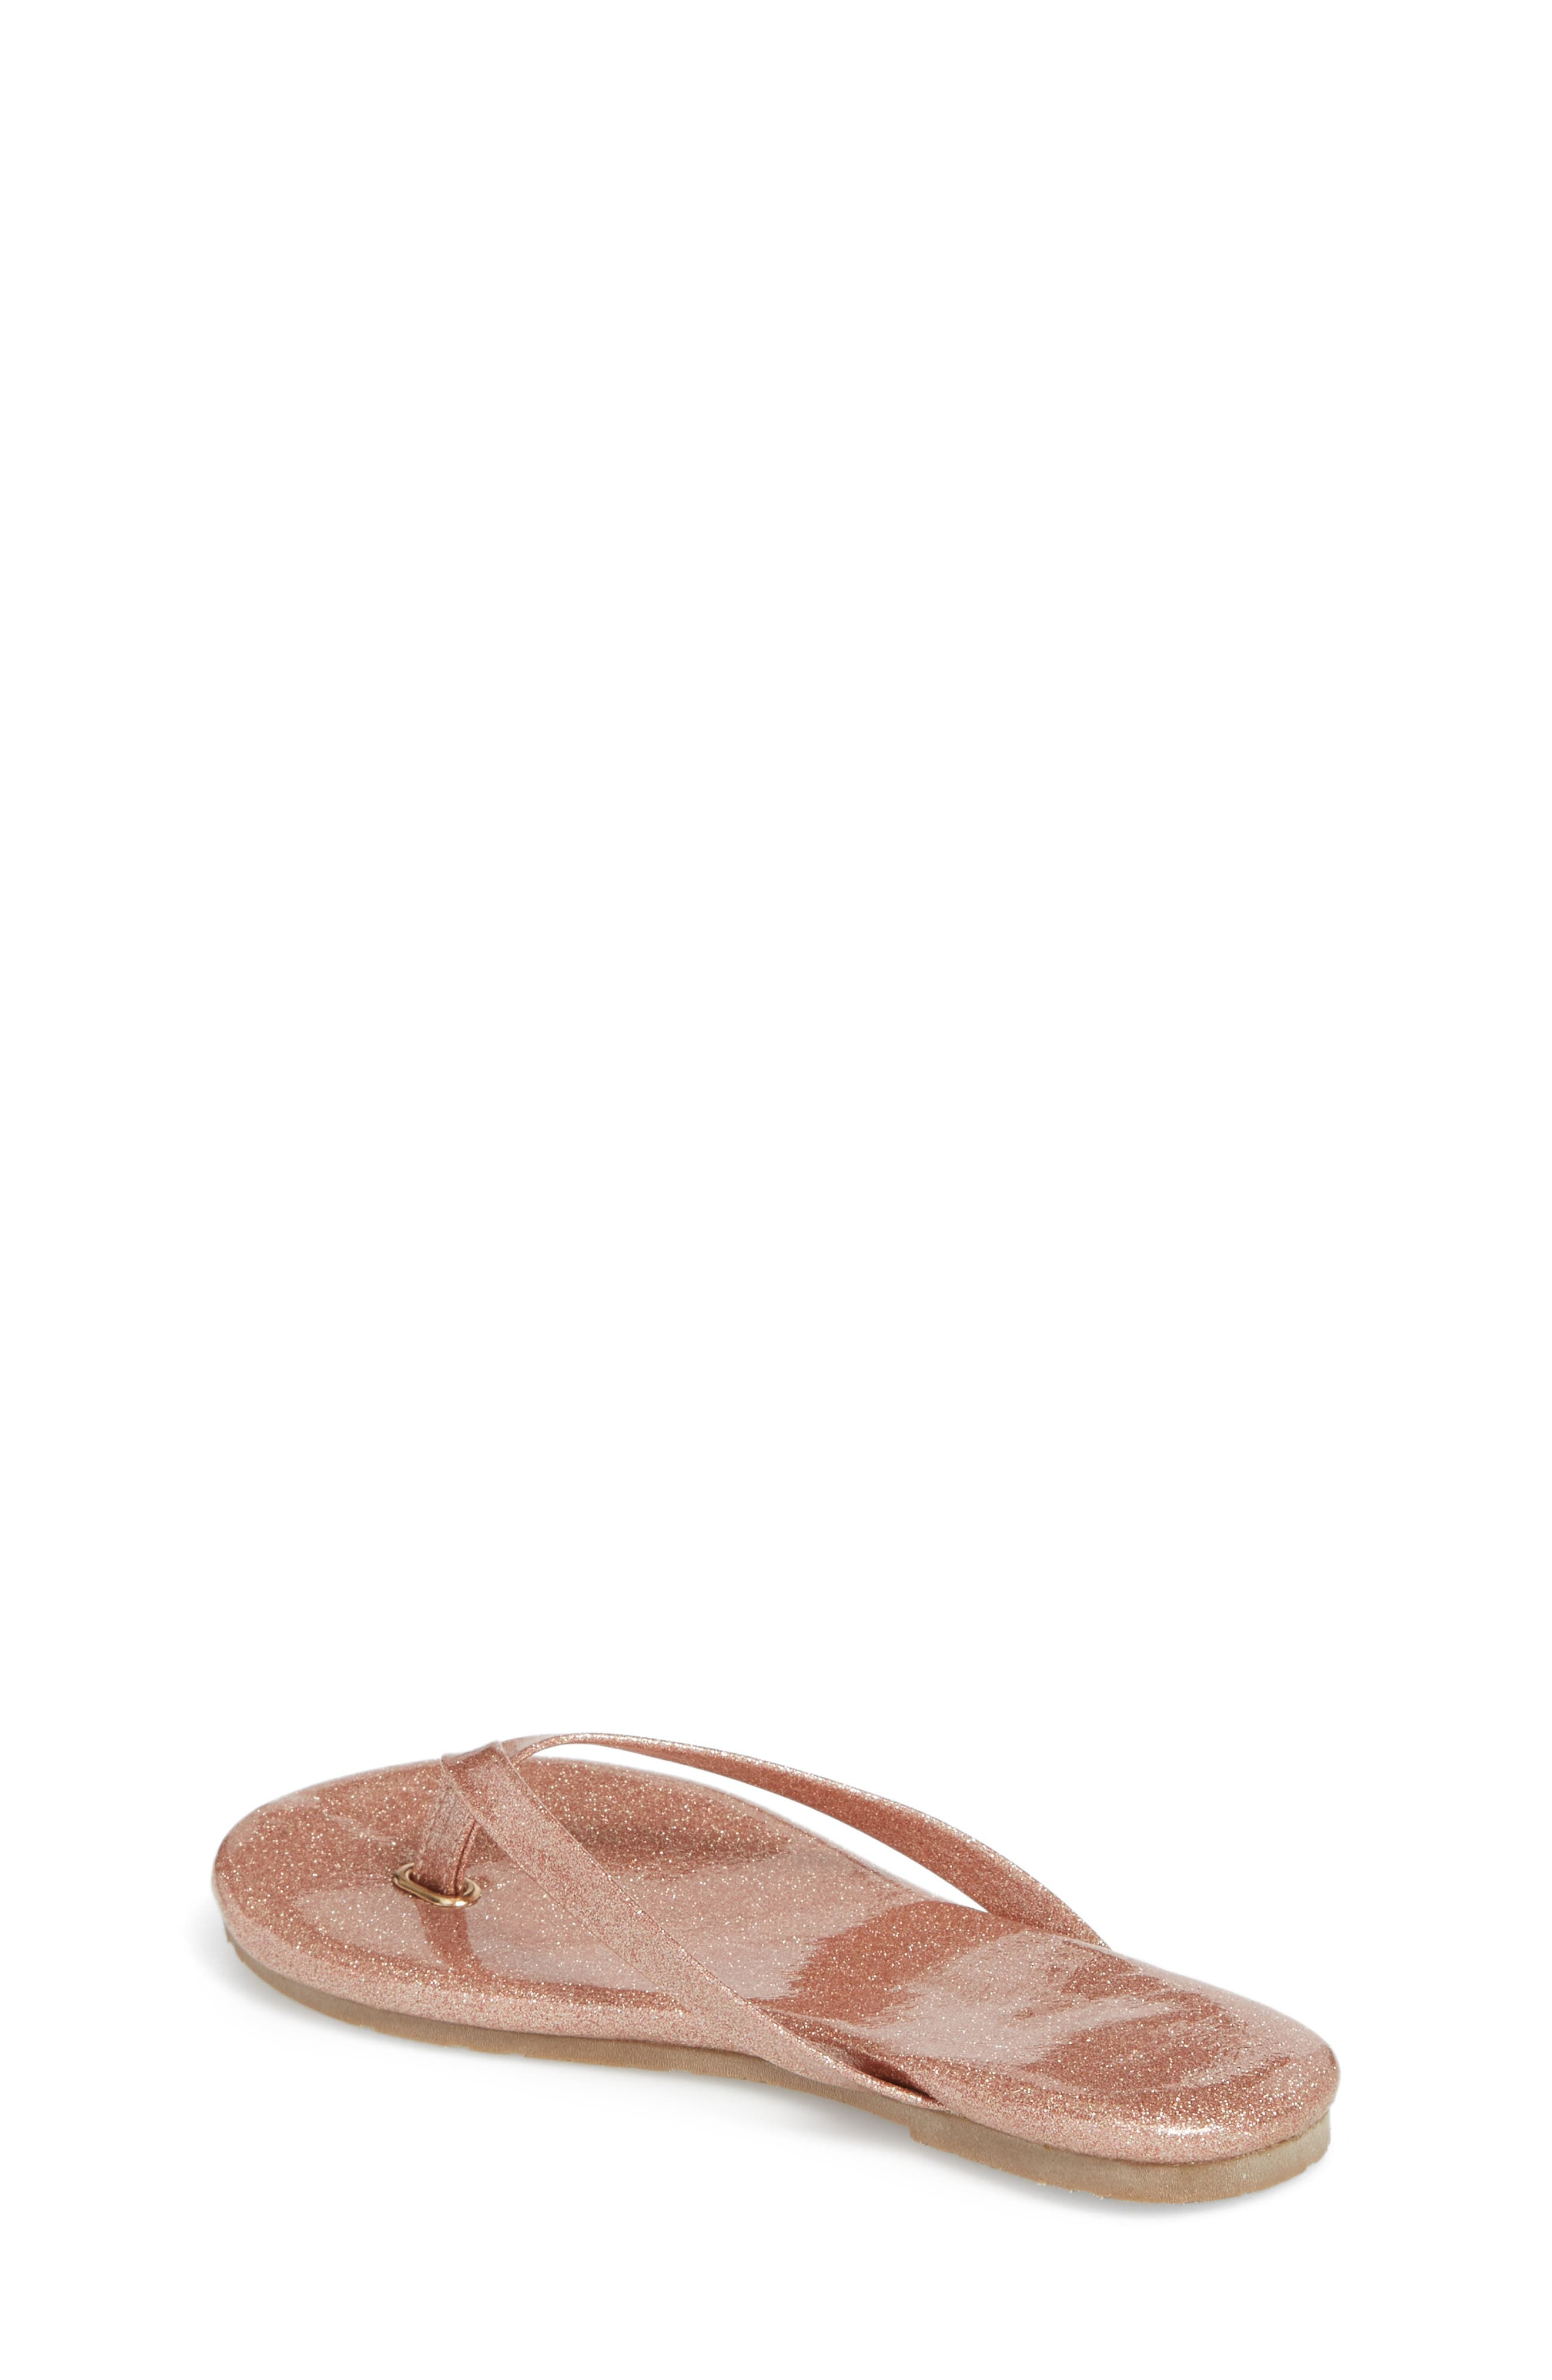 Rivington Flip Flop,                             Alternate thumbnail 2, color,                             Light Pink Patent Glitter